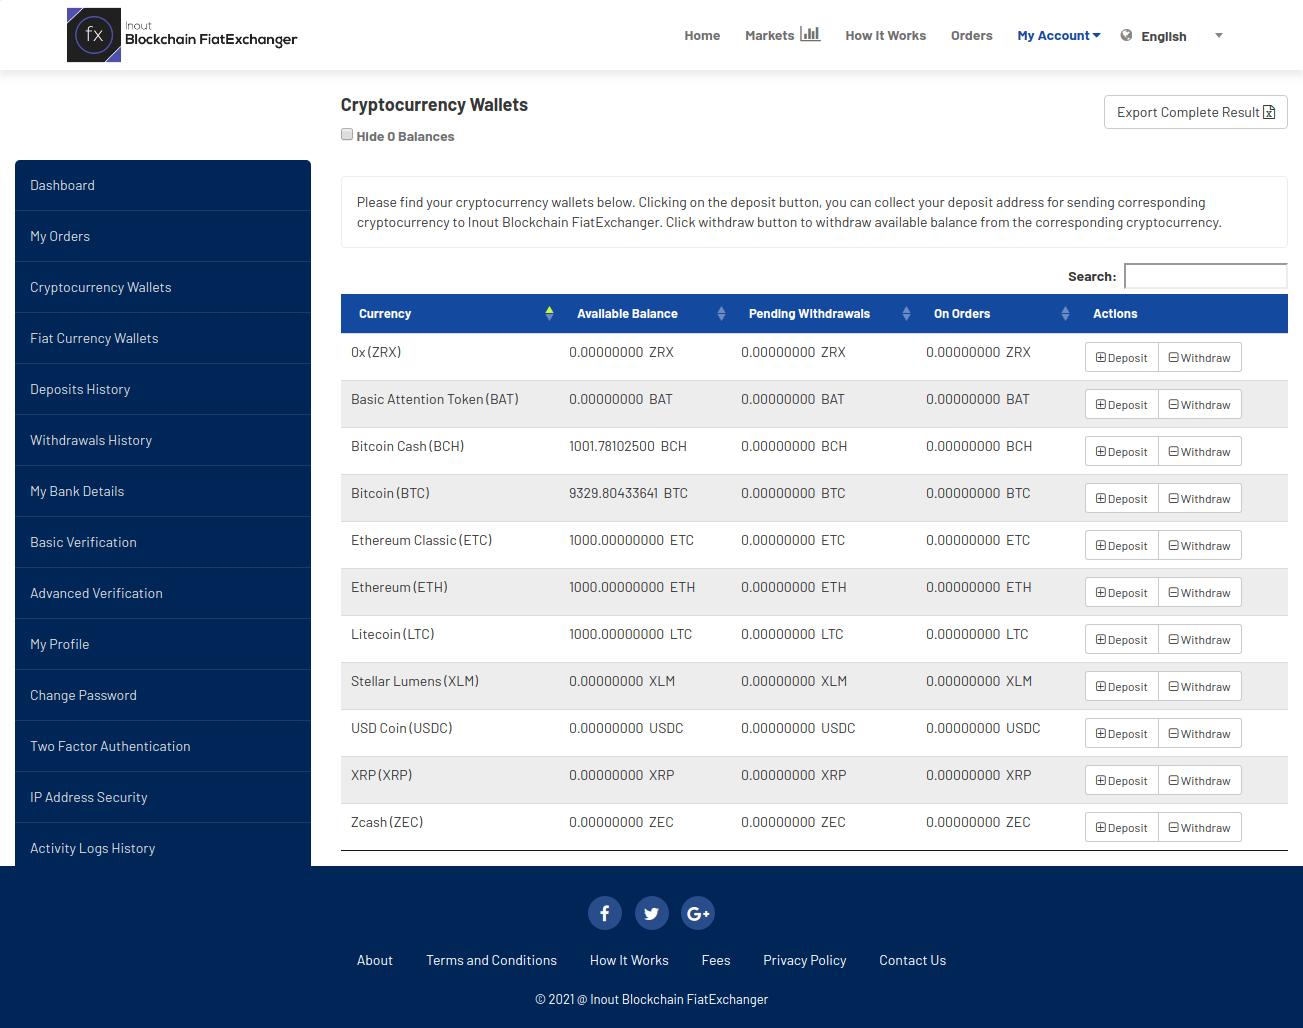 Inout Blockchain FiatExchanger - Cryptocurrency Exchange Script (Fiat to Crypto Exchange) - Screenshot 3